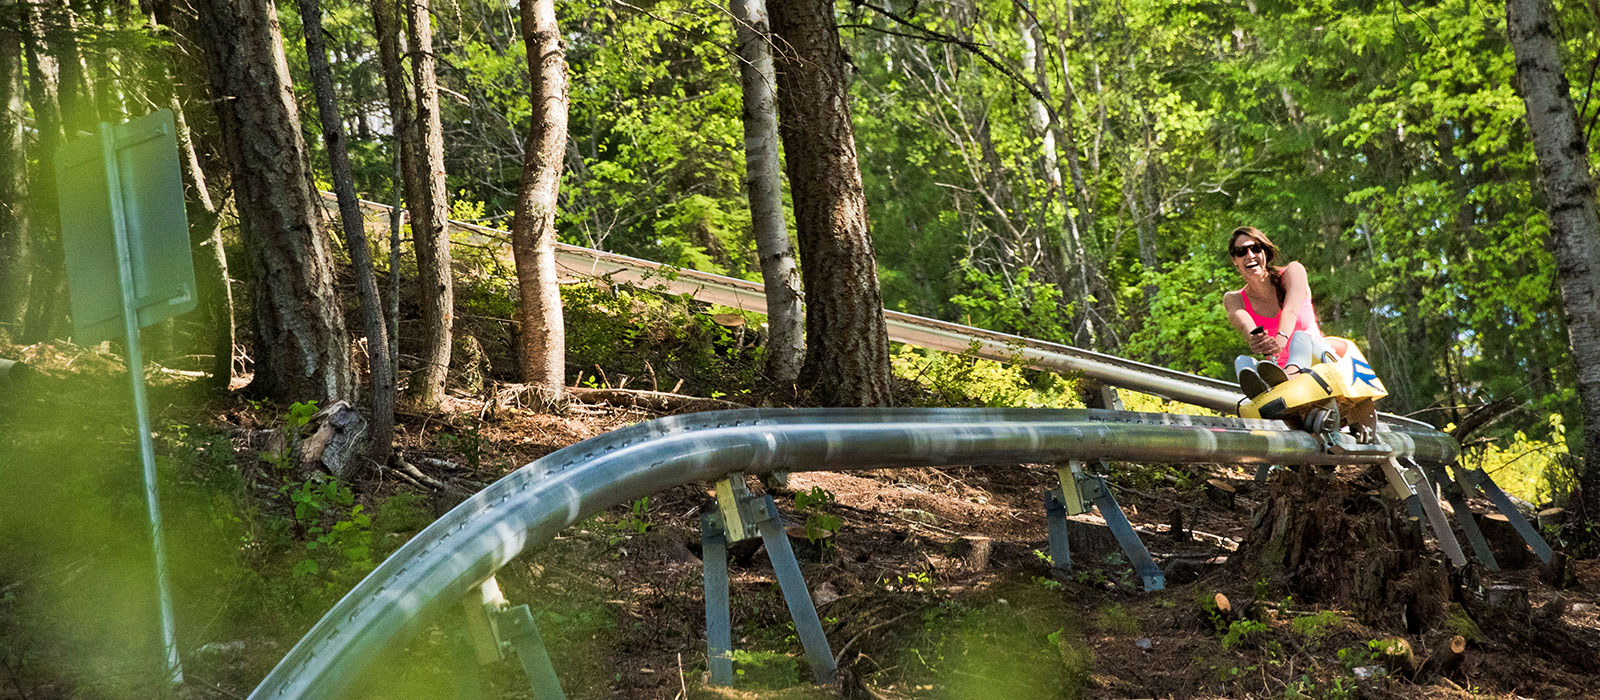 Revelstoke Mountain Coaster